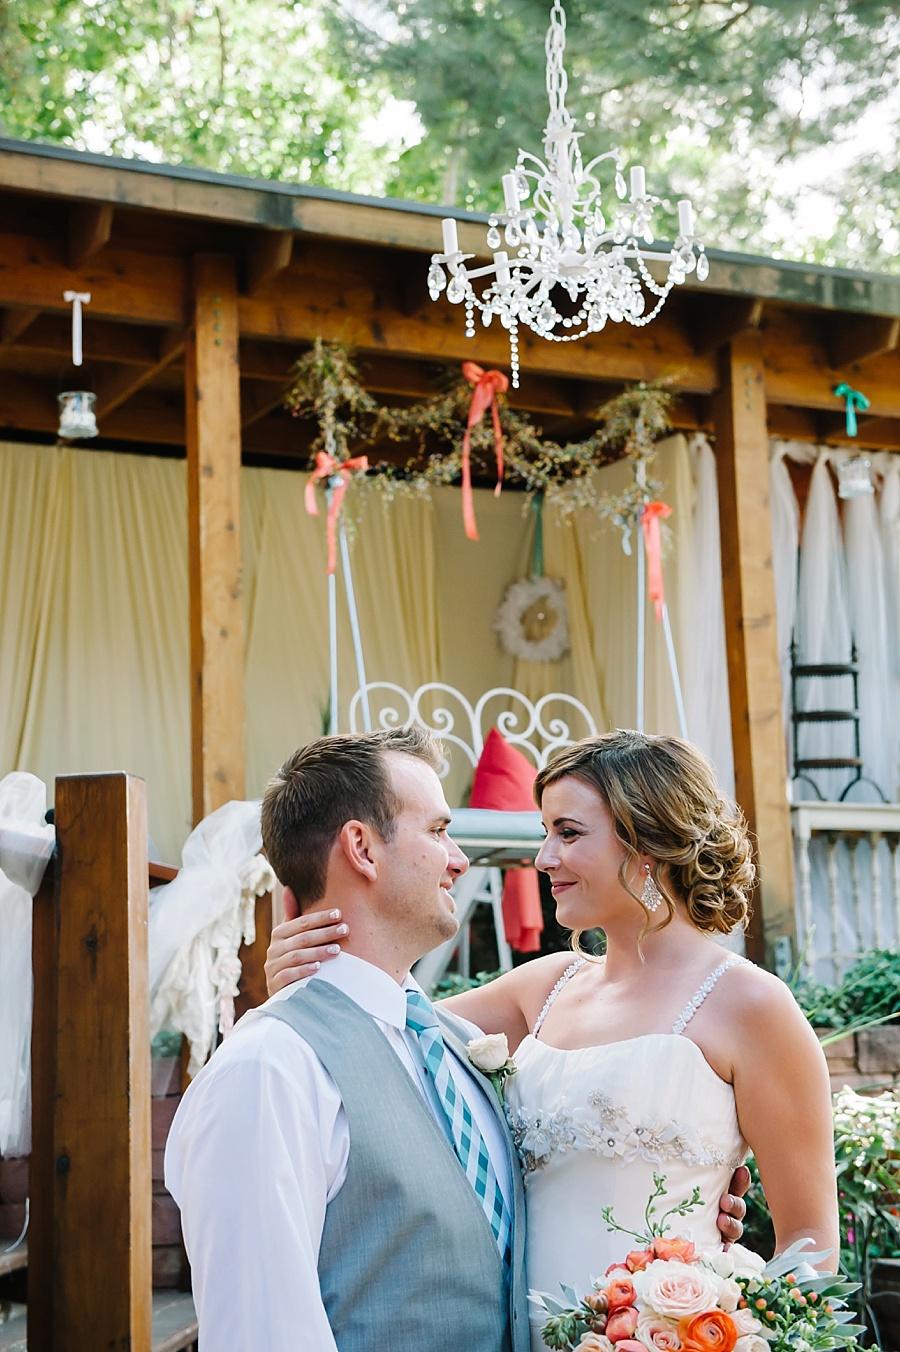 SLC Wedding Photographer Ali Sumsion 1098